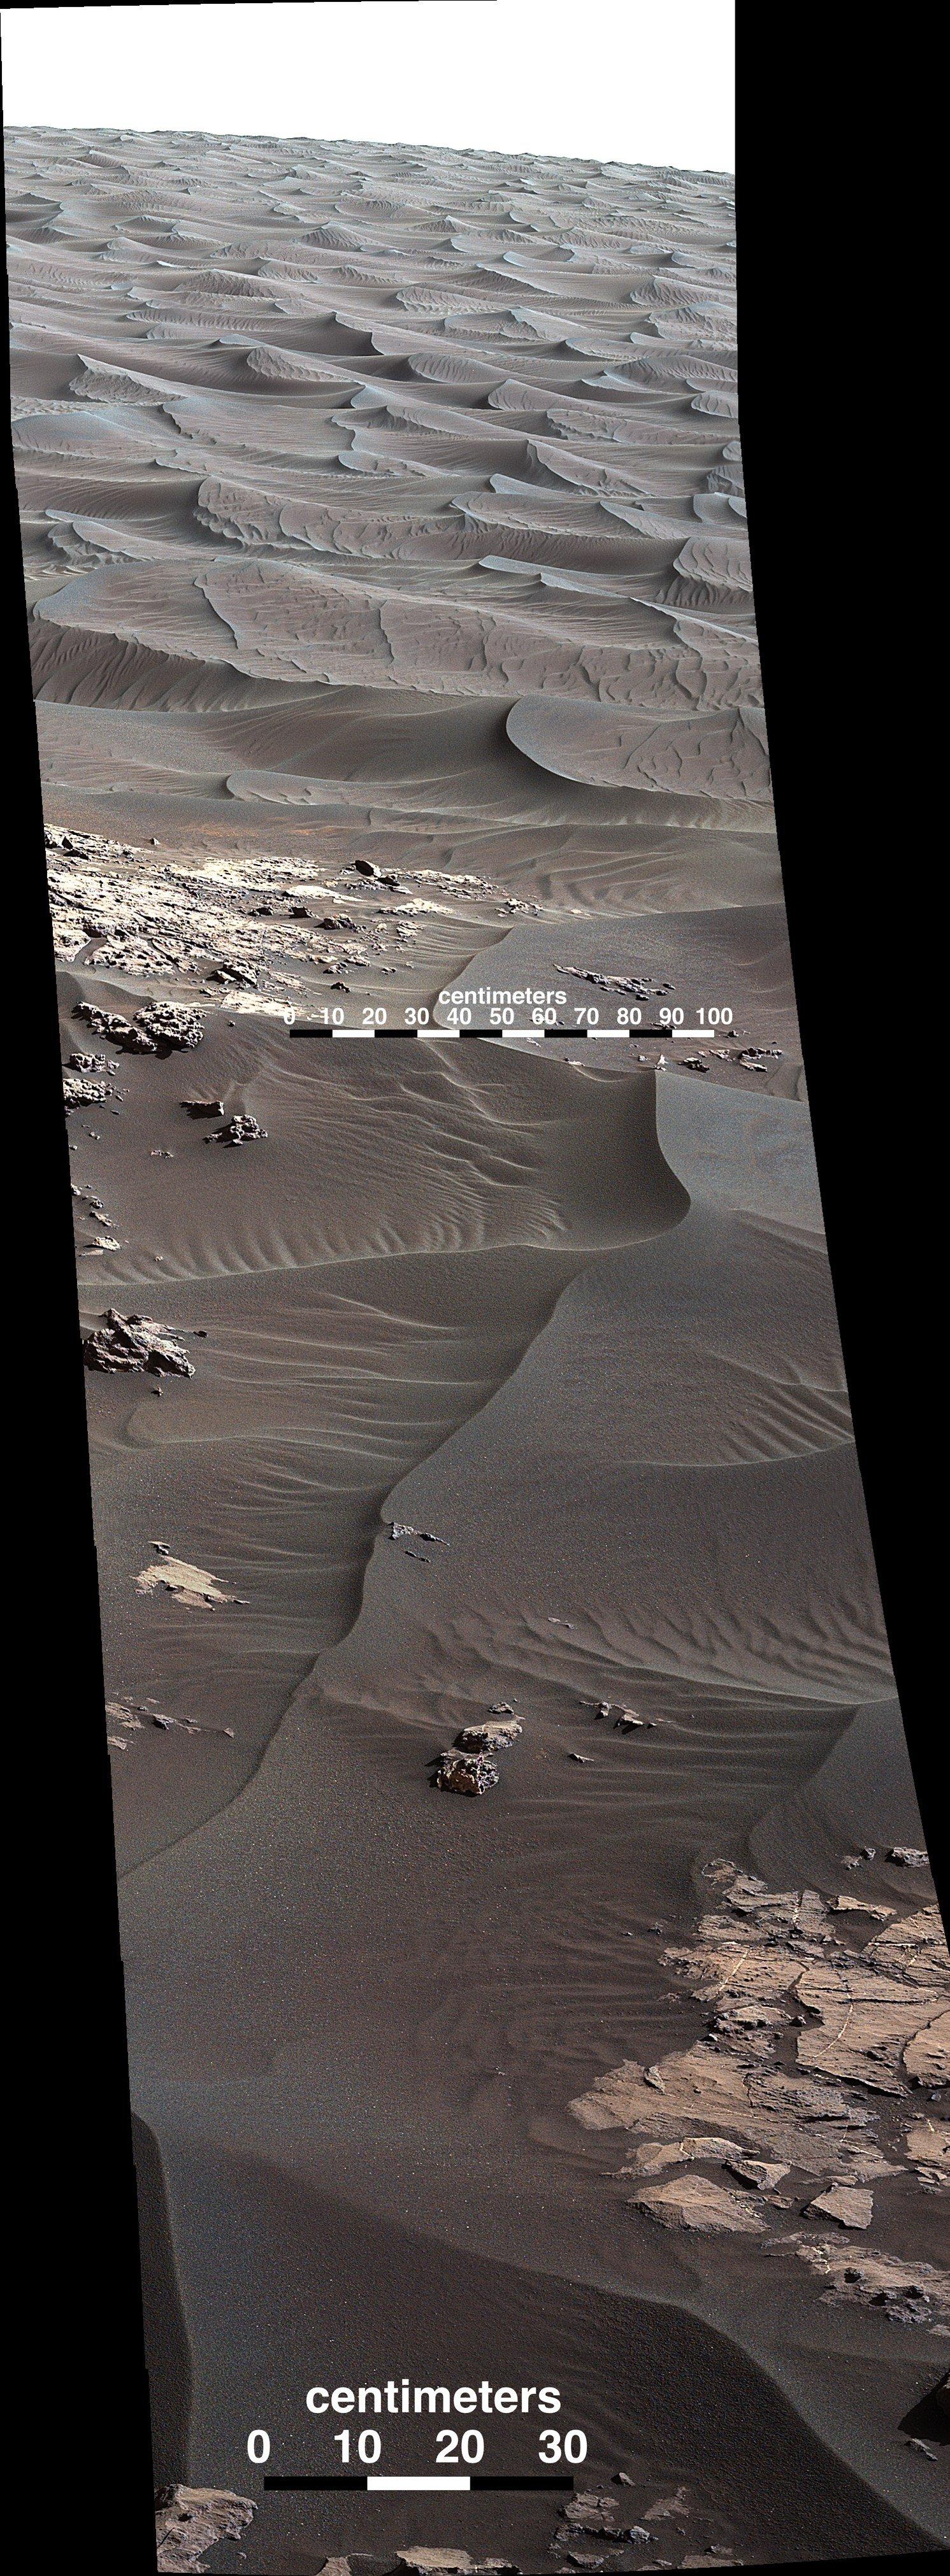 Credit:NASA/JPL/MSSS/Marco Di Lorenzo/Ken Kremer/kenkremer.com